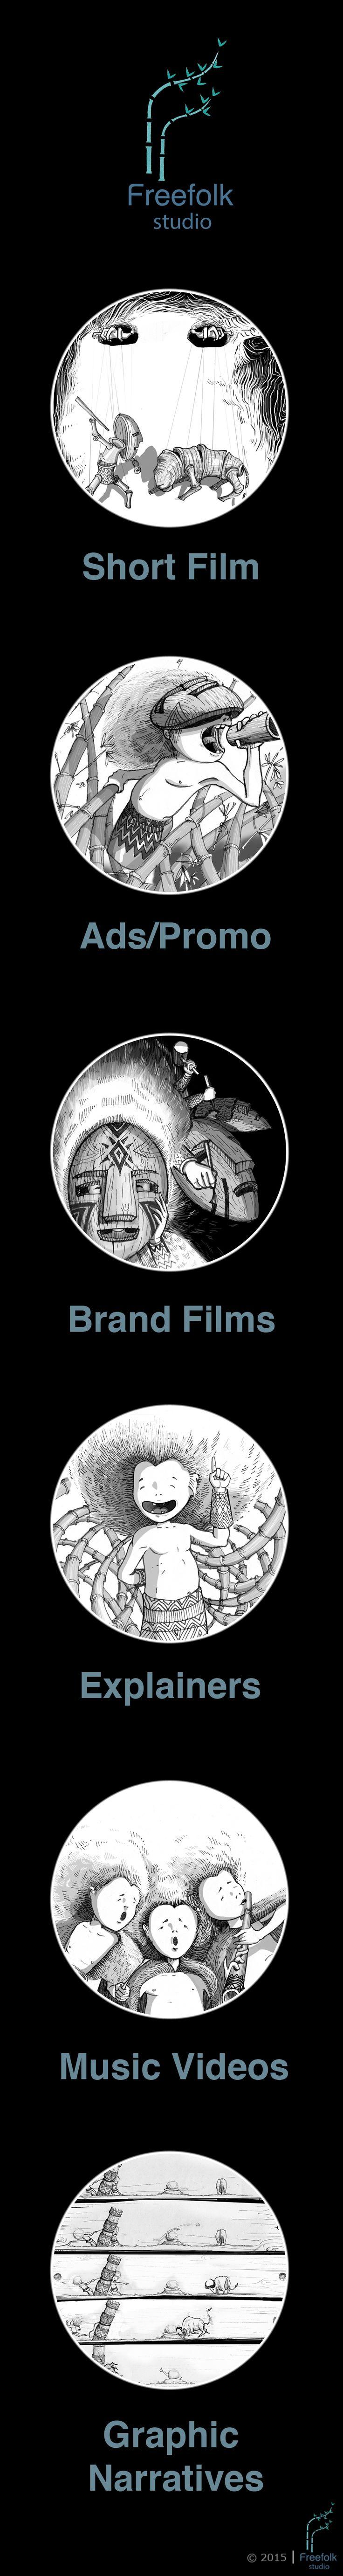 Freefolk Studio is visual communication design studio. #FreefolkStudio #Freefolk #AnimationServices #ConceptArt #InkArt #AnimationLove #LoveGhibliStudio             http://www.freefolkstudio.com/